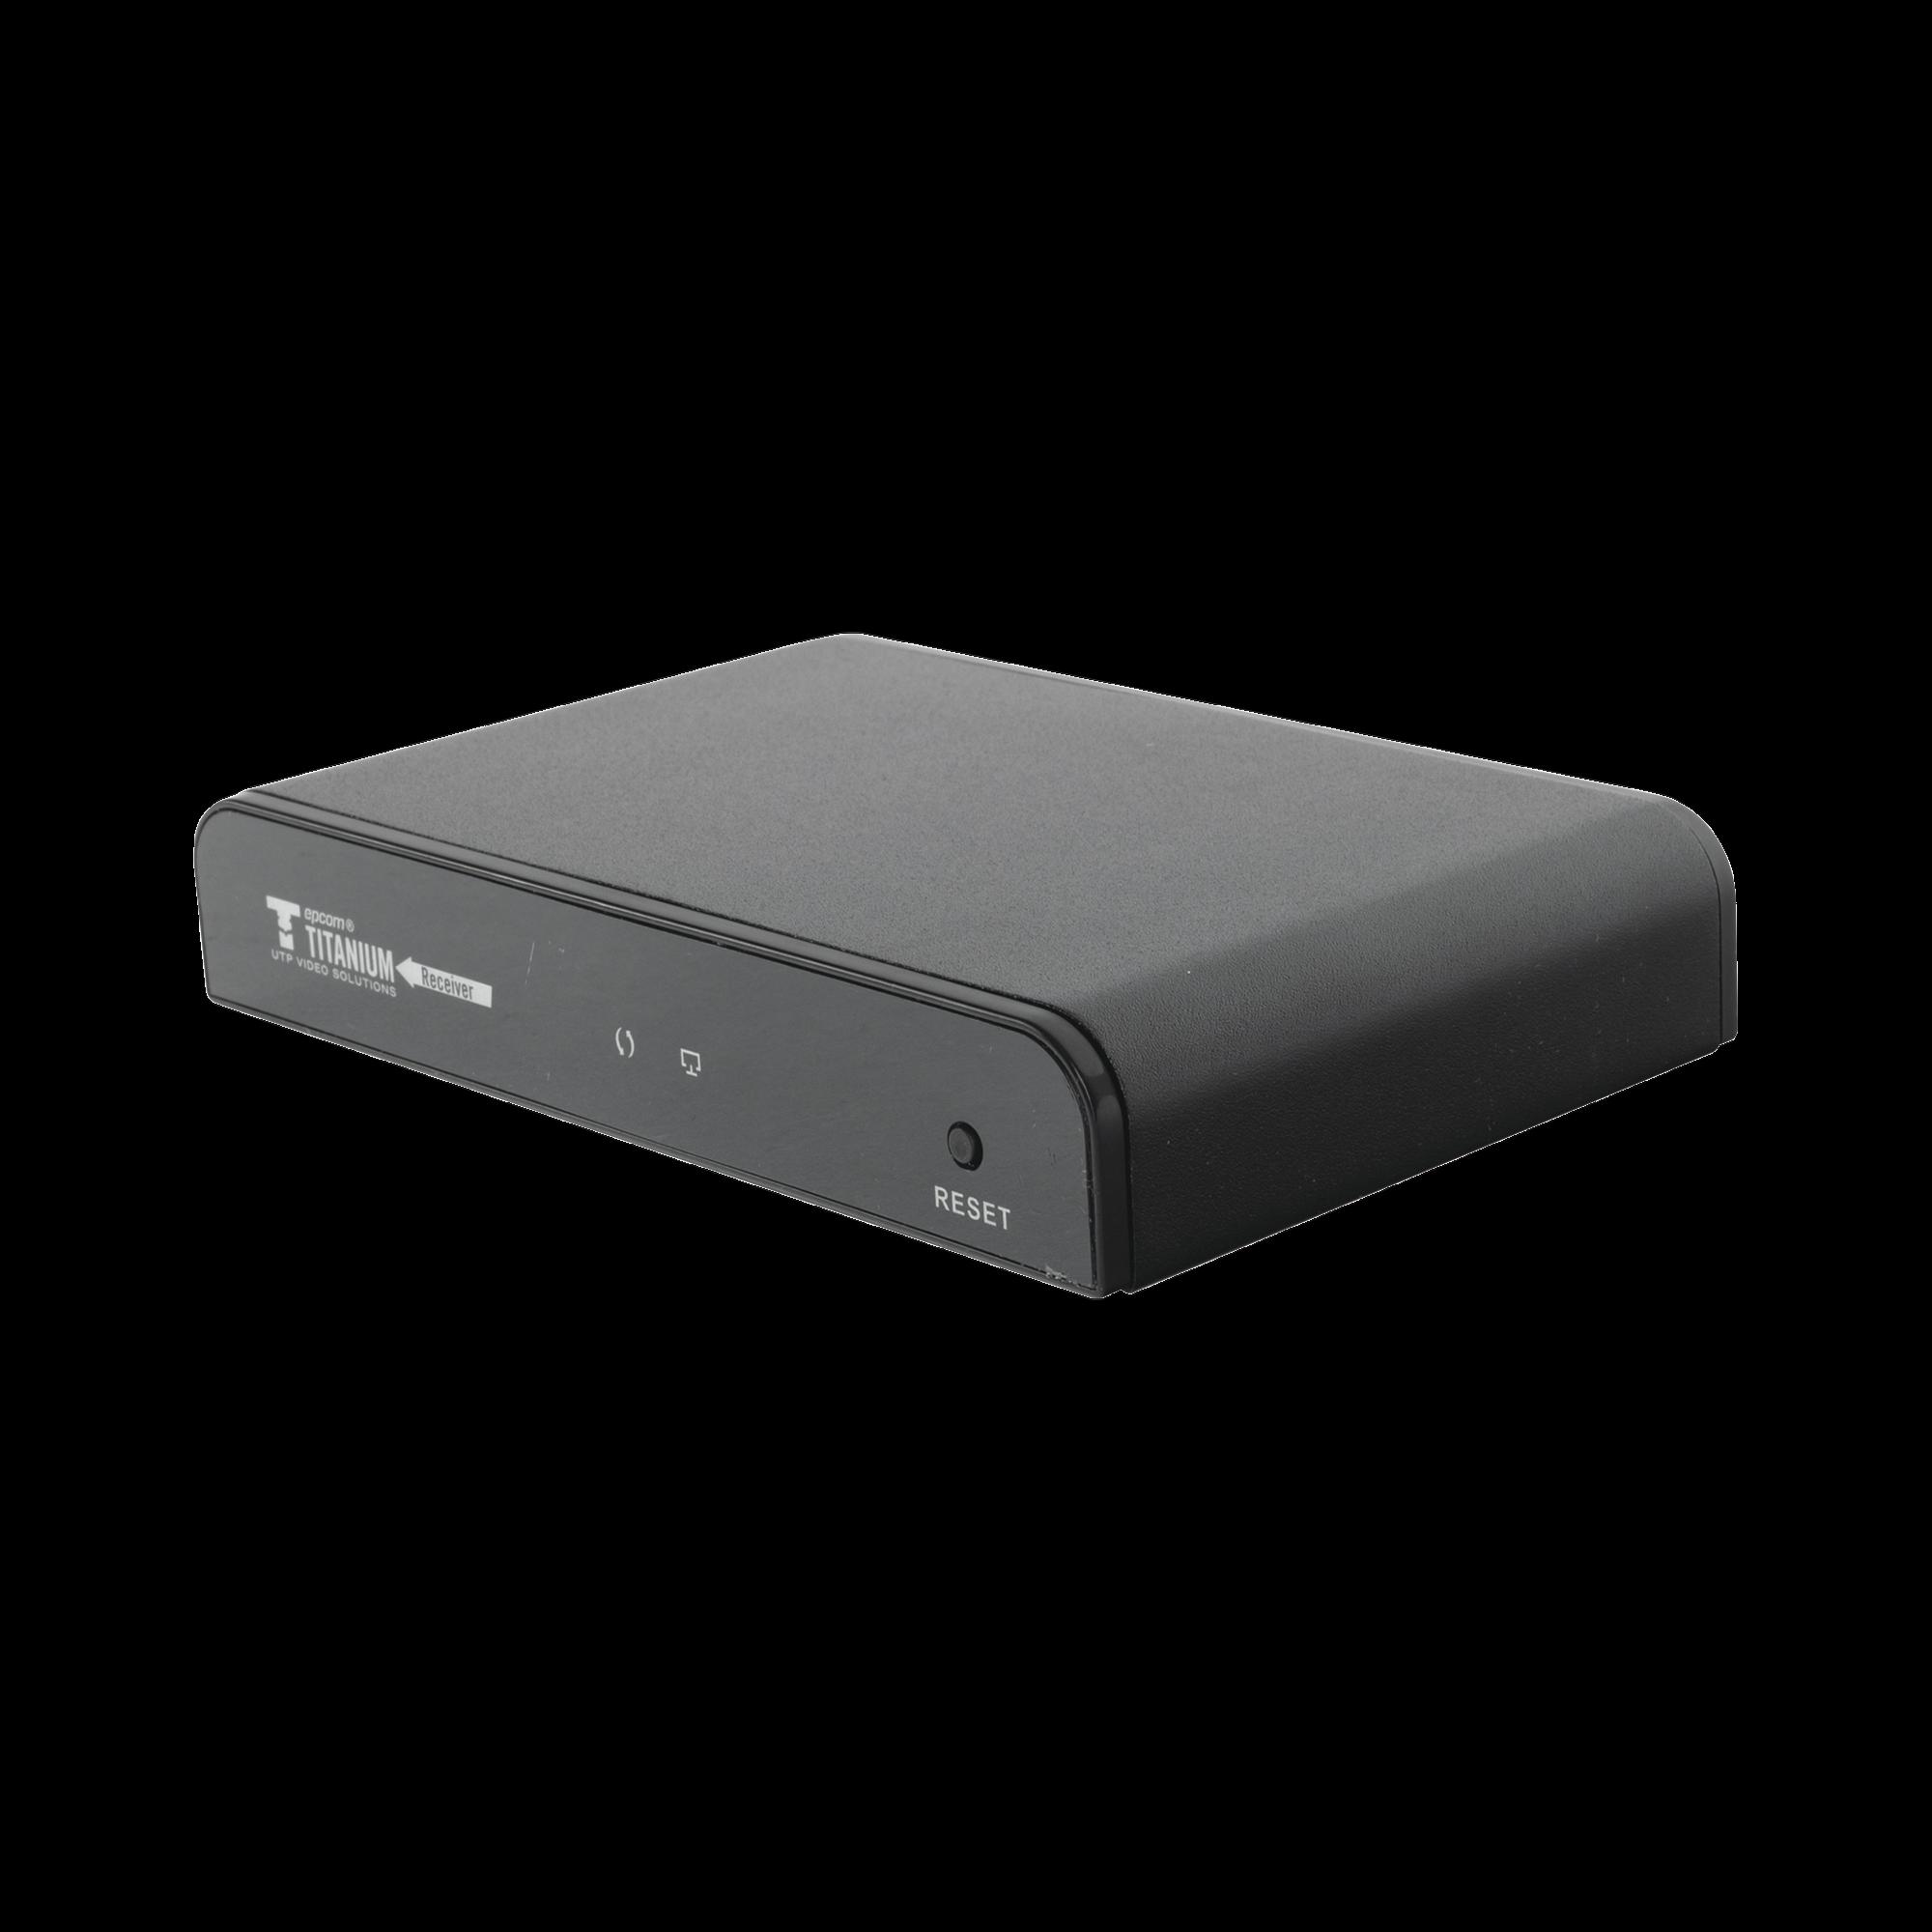 Receptor para uso en Kit TT383PRO hasta 120 metros, Cat 5e/6, control IR, 1080 p@50/60 Hz. con protocolo HDbitT